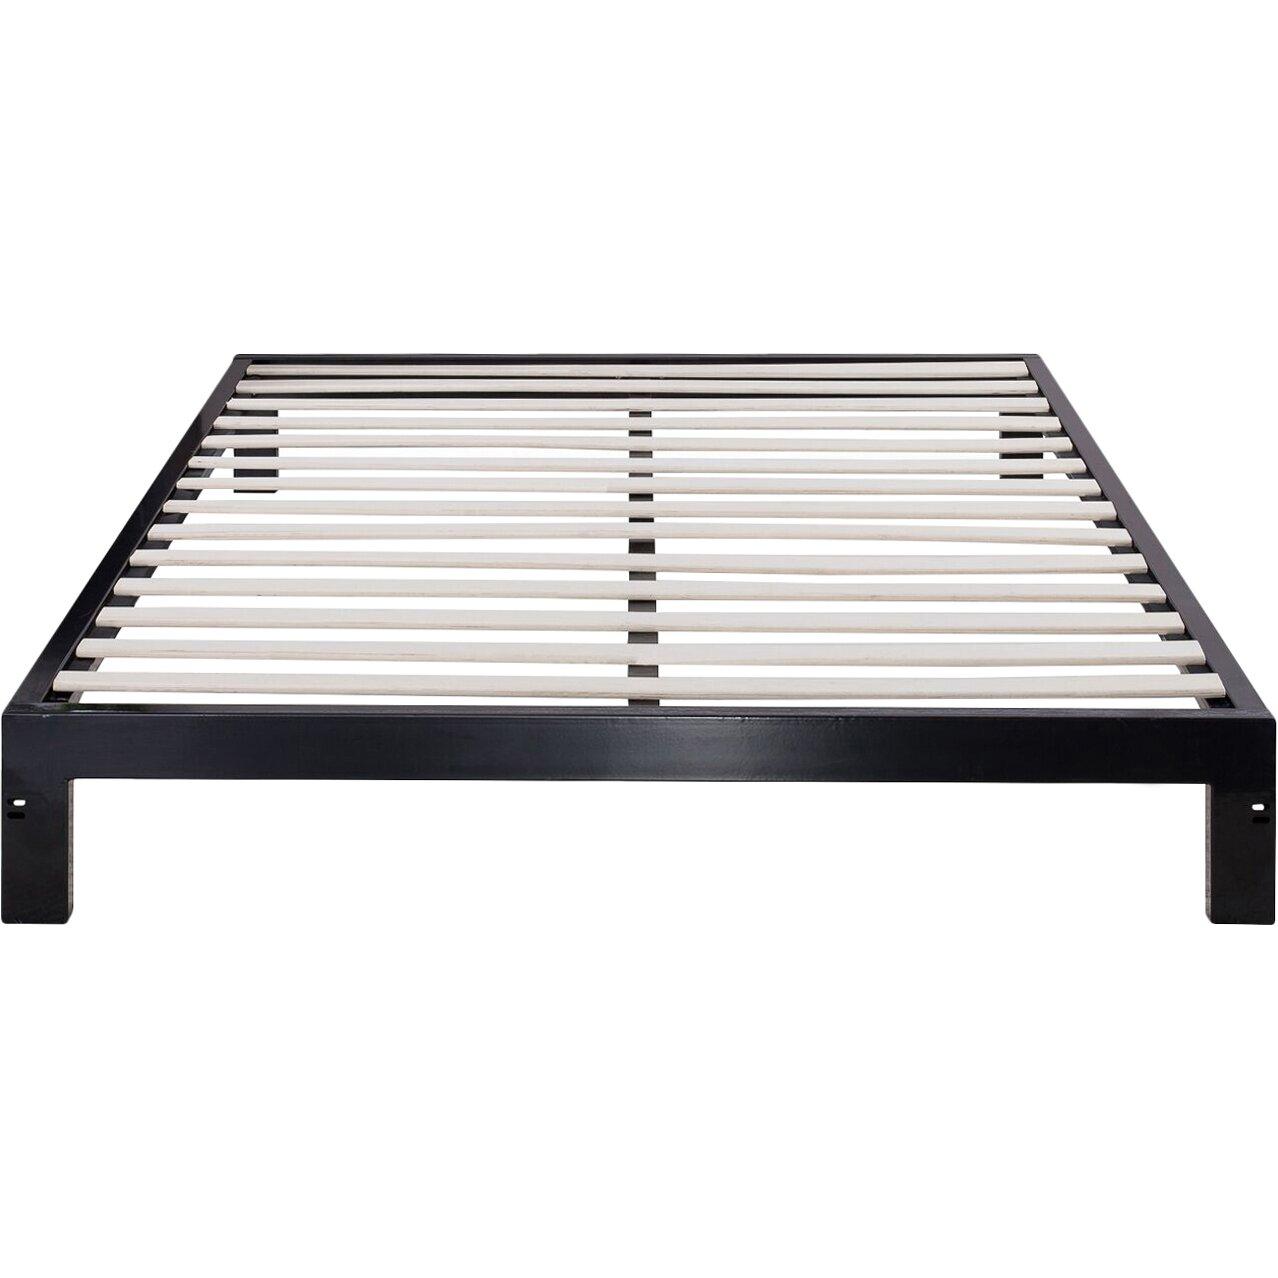 OrthoTherapy Platform Metal 2000 Bed Frame Mattress